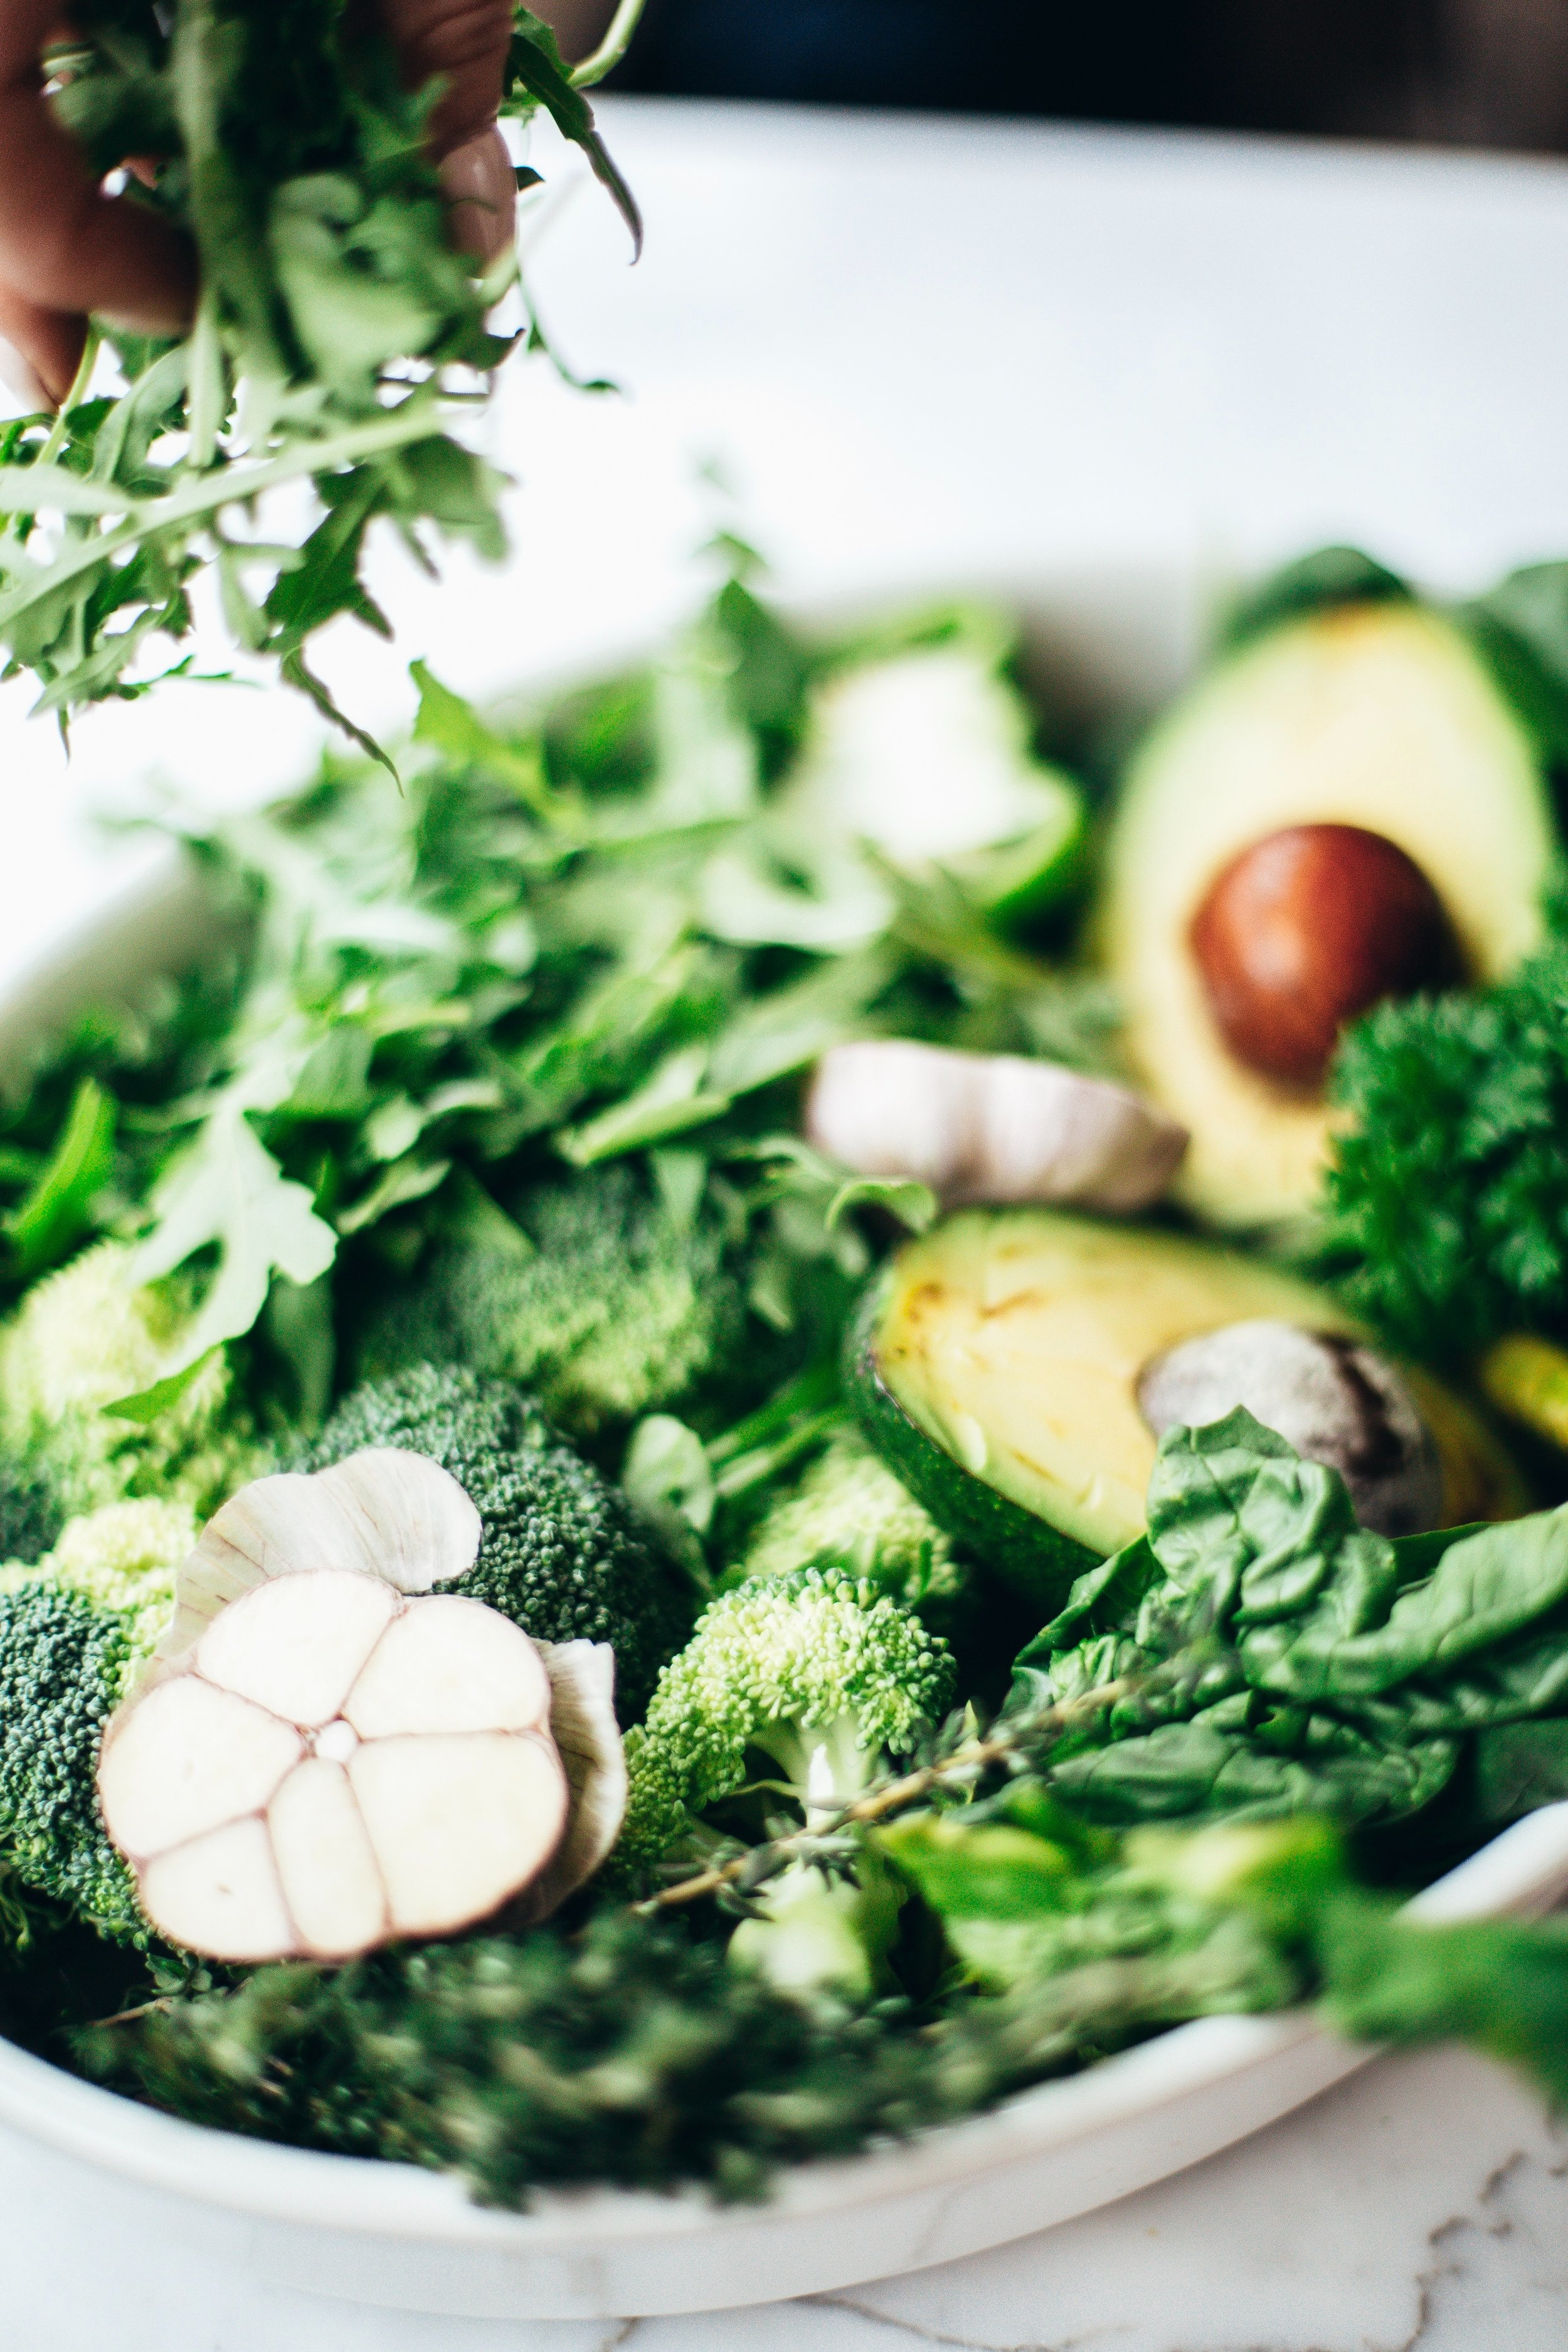 broccoli-delicious-diet-1580466.jpg